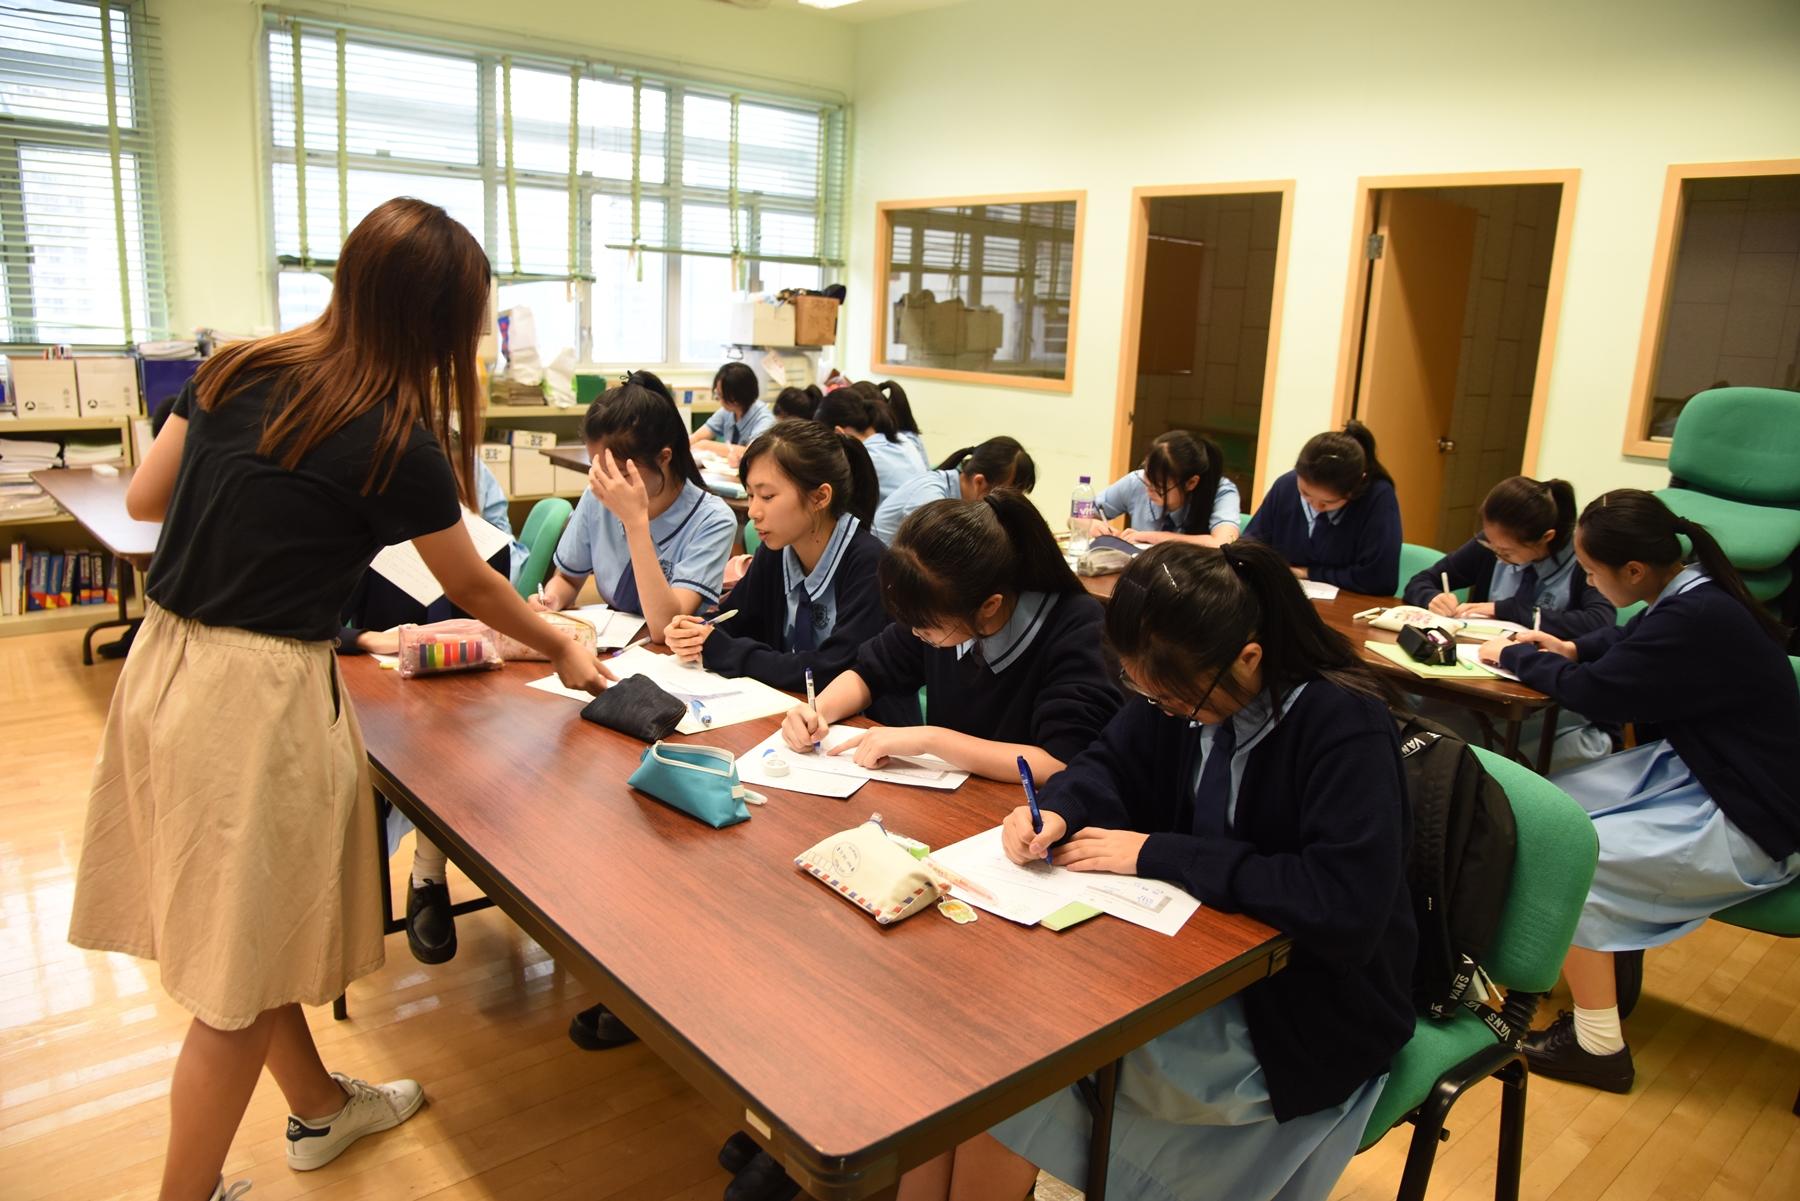 http://npc.edu.hk/sites/default/files/dsc_6721.jpg